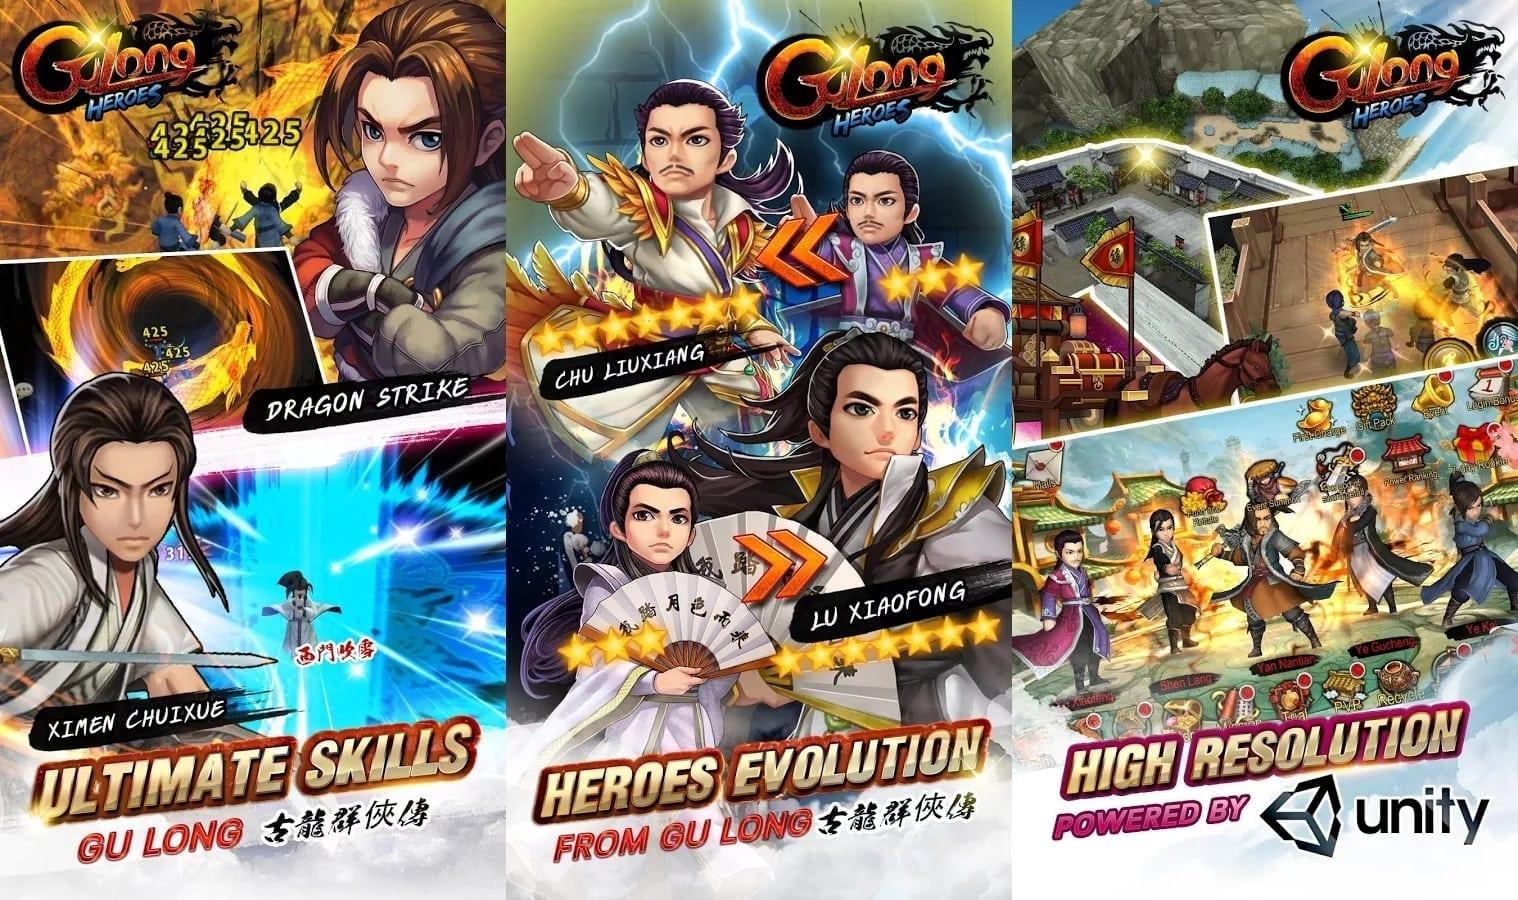 gulong-heroes-image